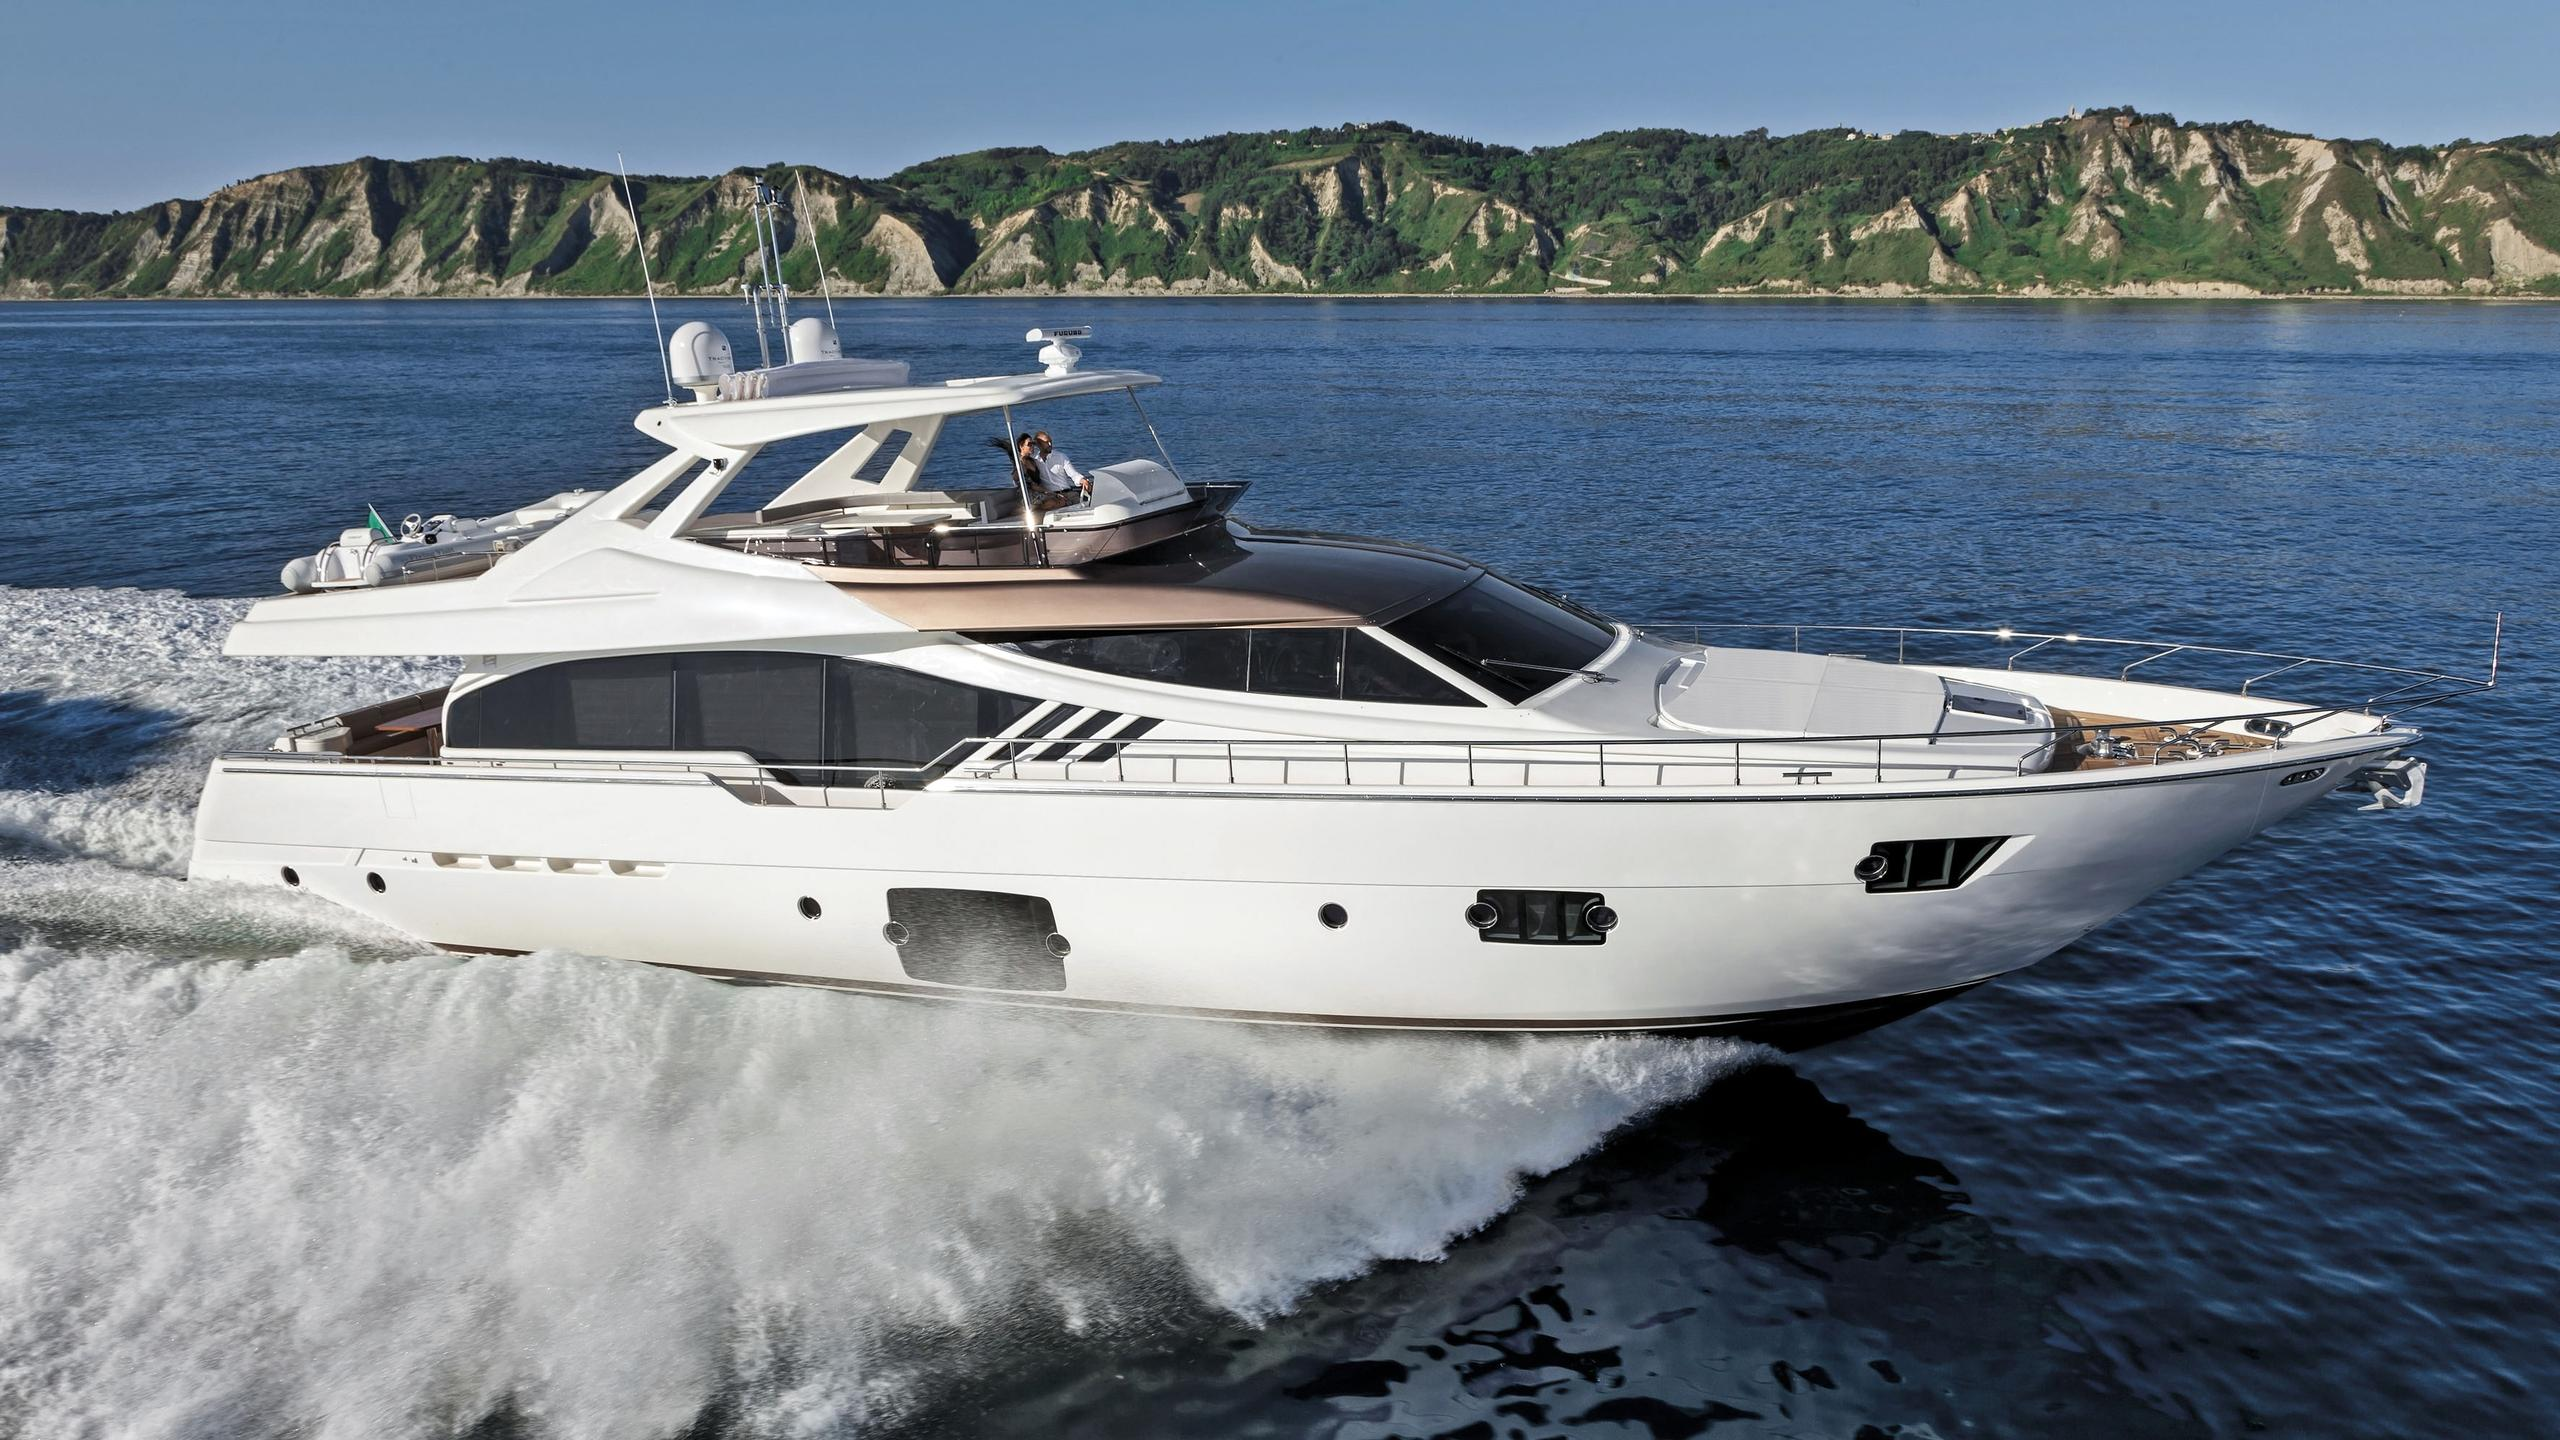 ferretti-870-03-motor-yacht-ferretti-2012-27m-cruising